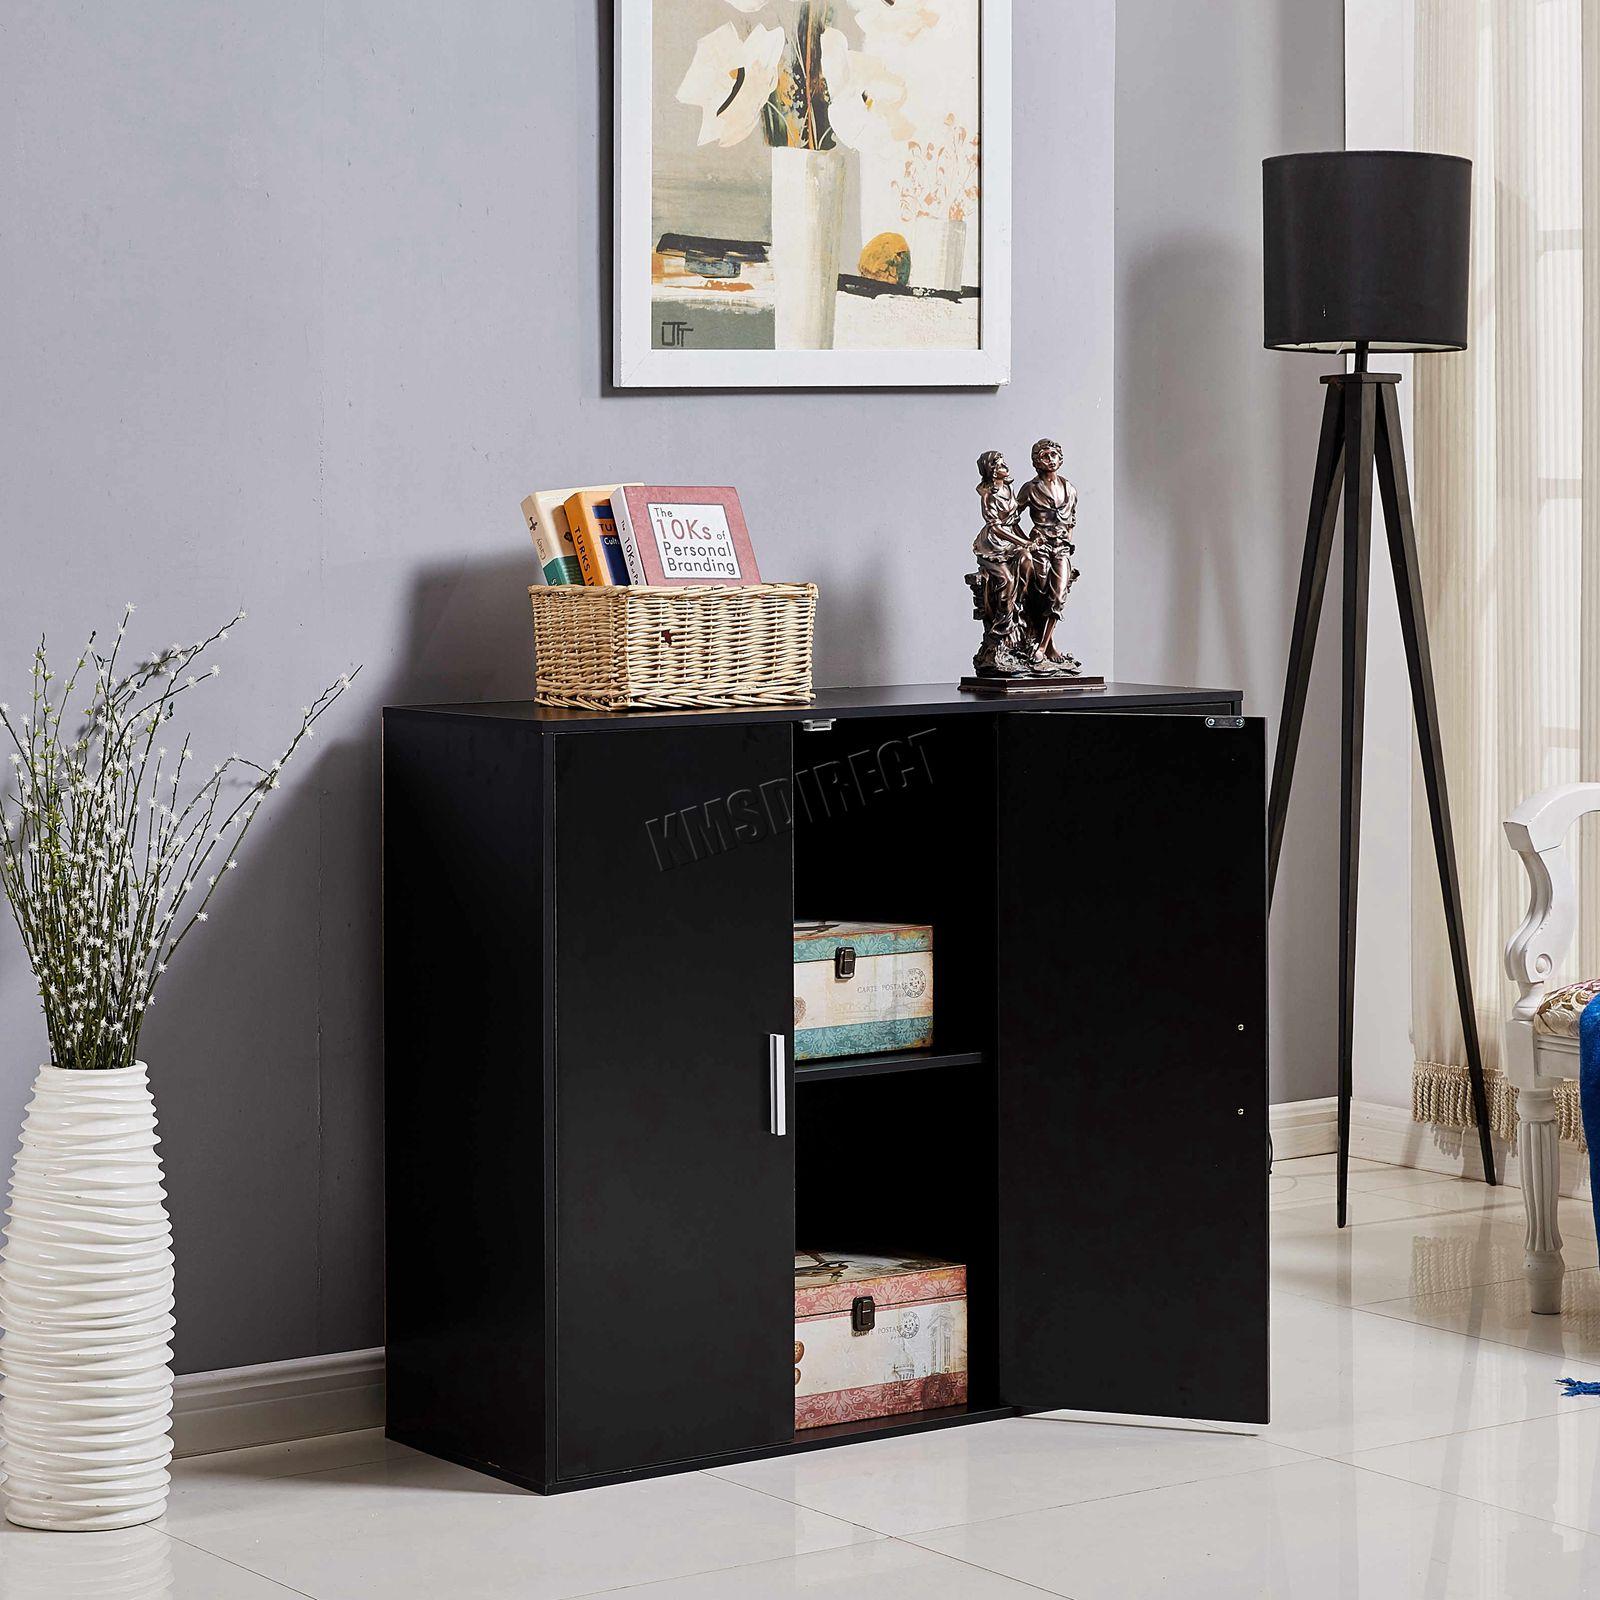 WestWood-Sideboard-Cabinet-Storage-tableware-Kitchen-Cupboard-Unit-PB-SSP01-NEW thumbnail 26